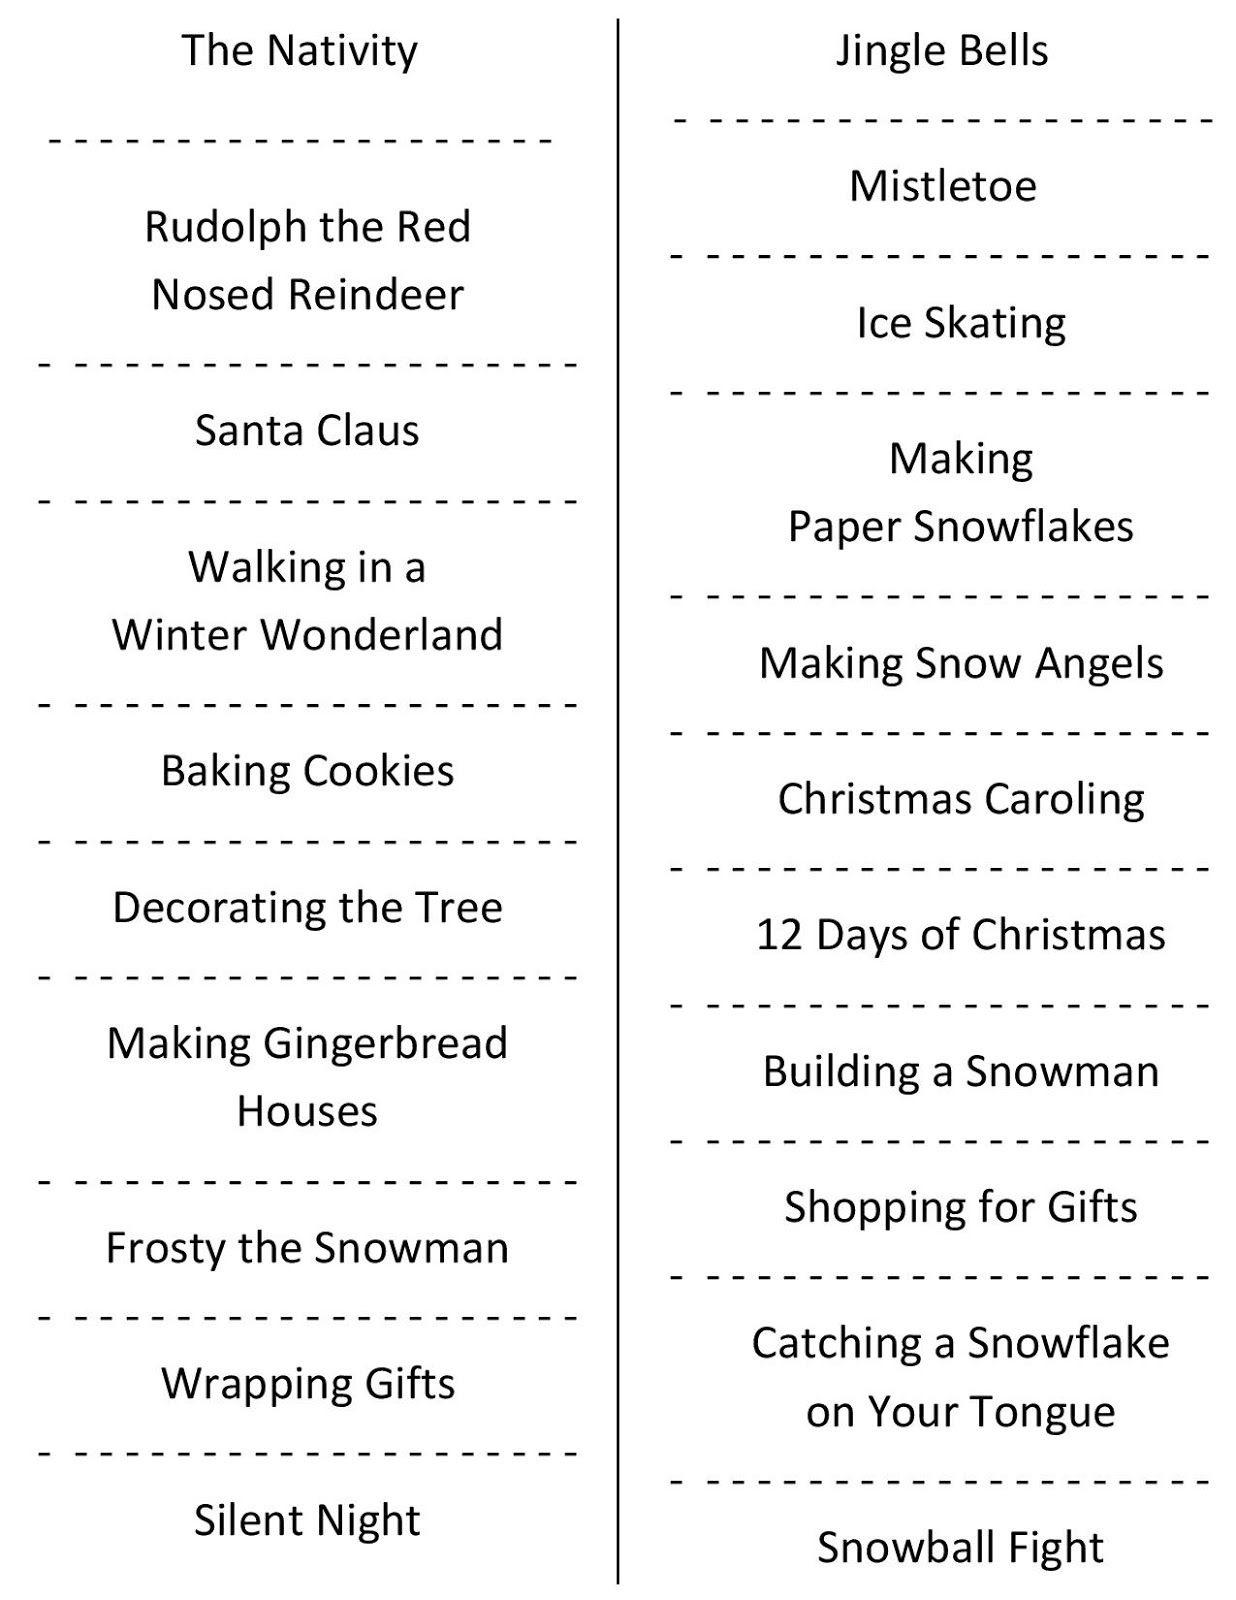 Christmas Charades (Free Printable Party Game)   Christmas   Daily - Free Printable Christmas Charades Cards